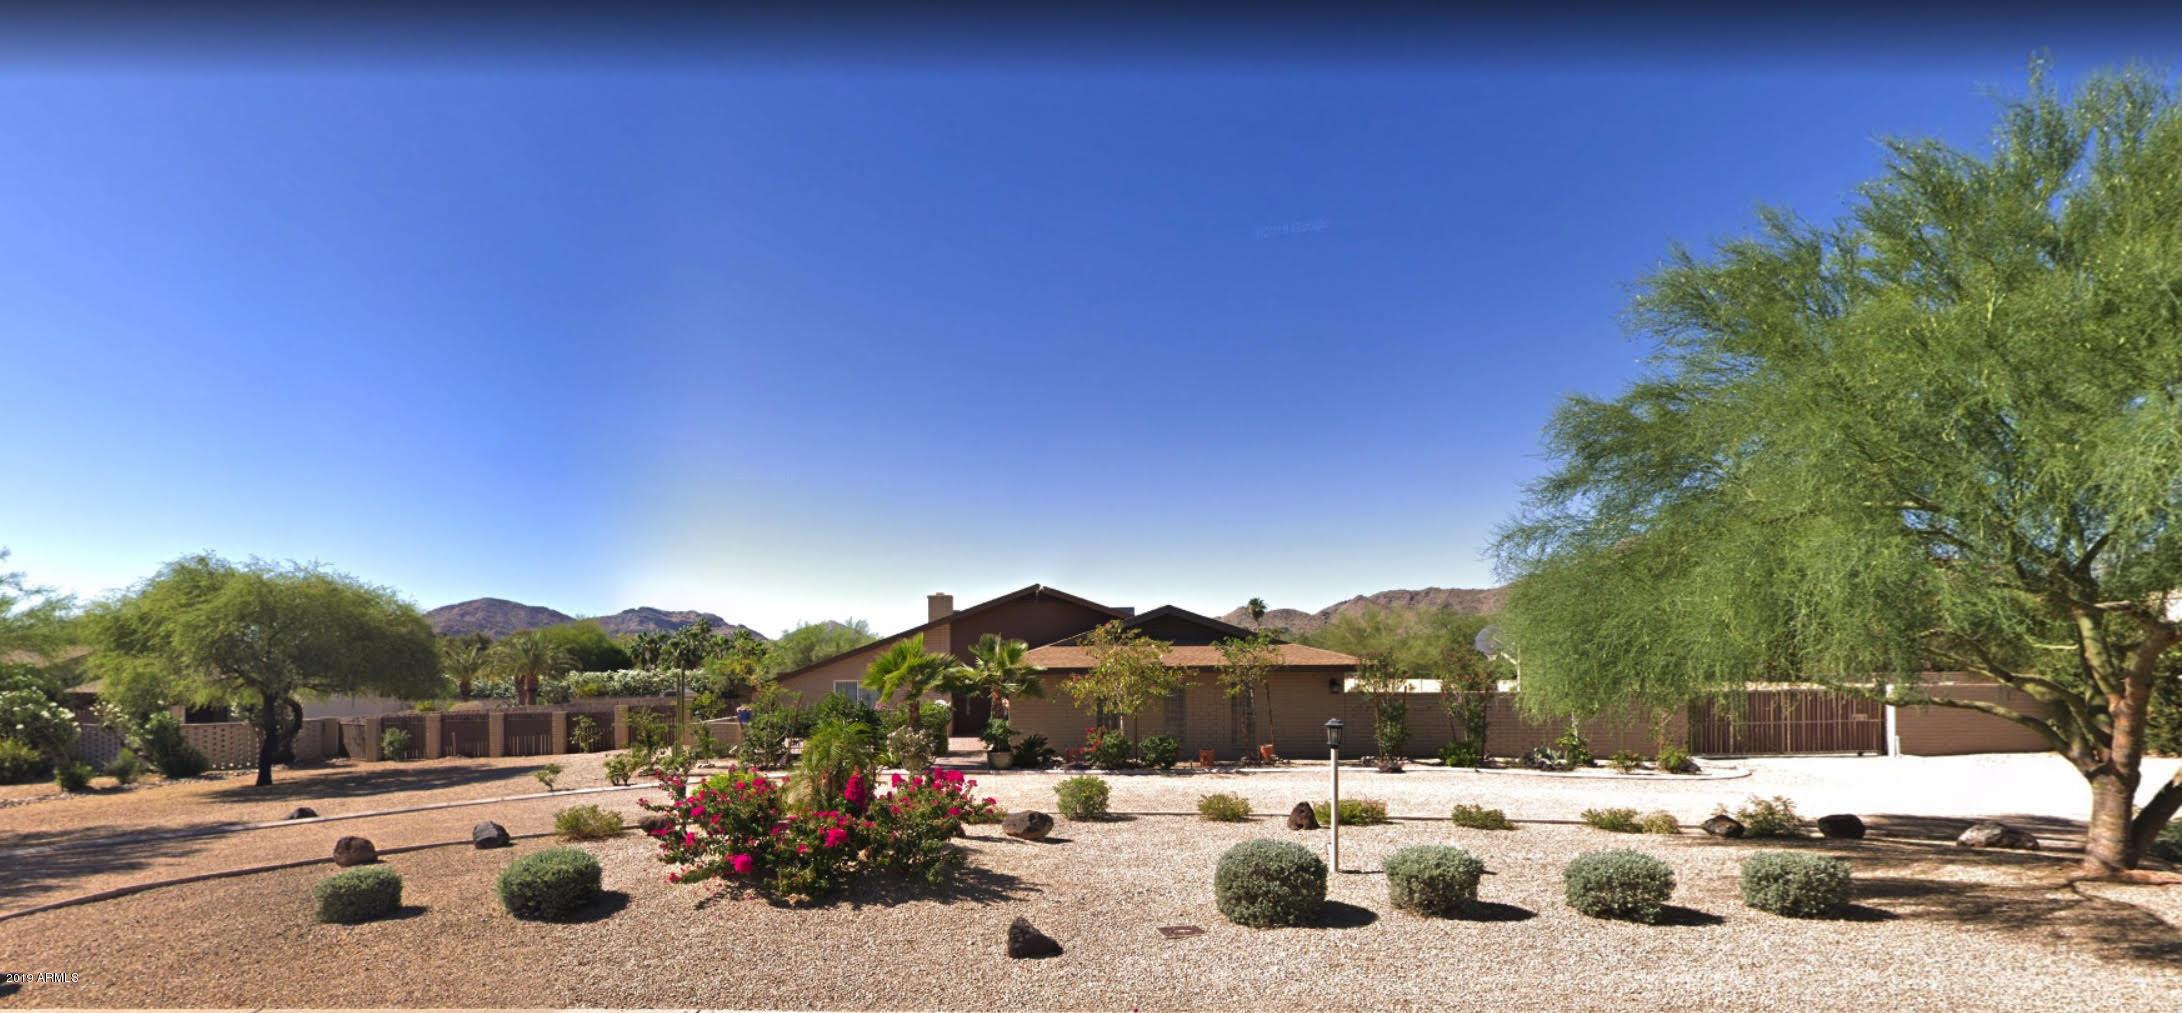 Photo of 4811 E Fanfol Drive, Paradise Valley, AZ 85253